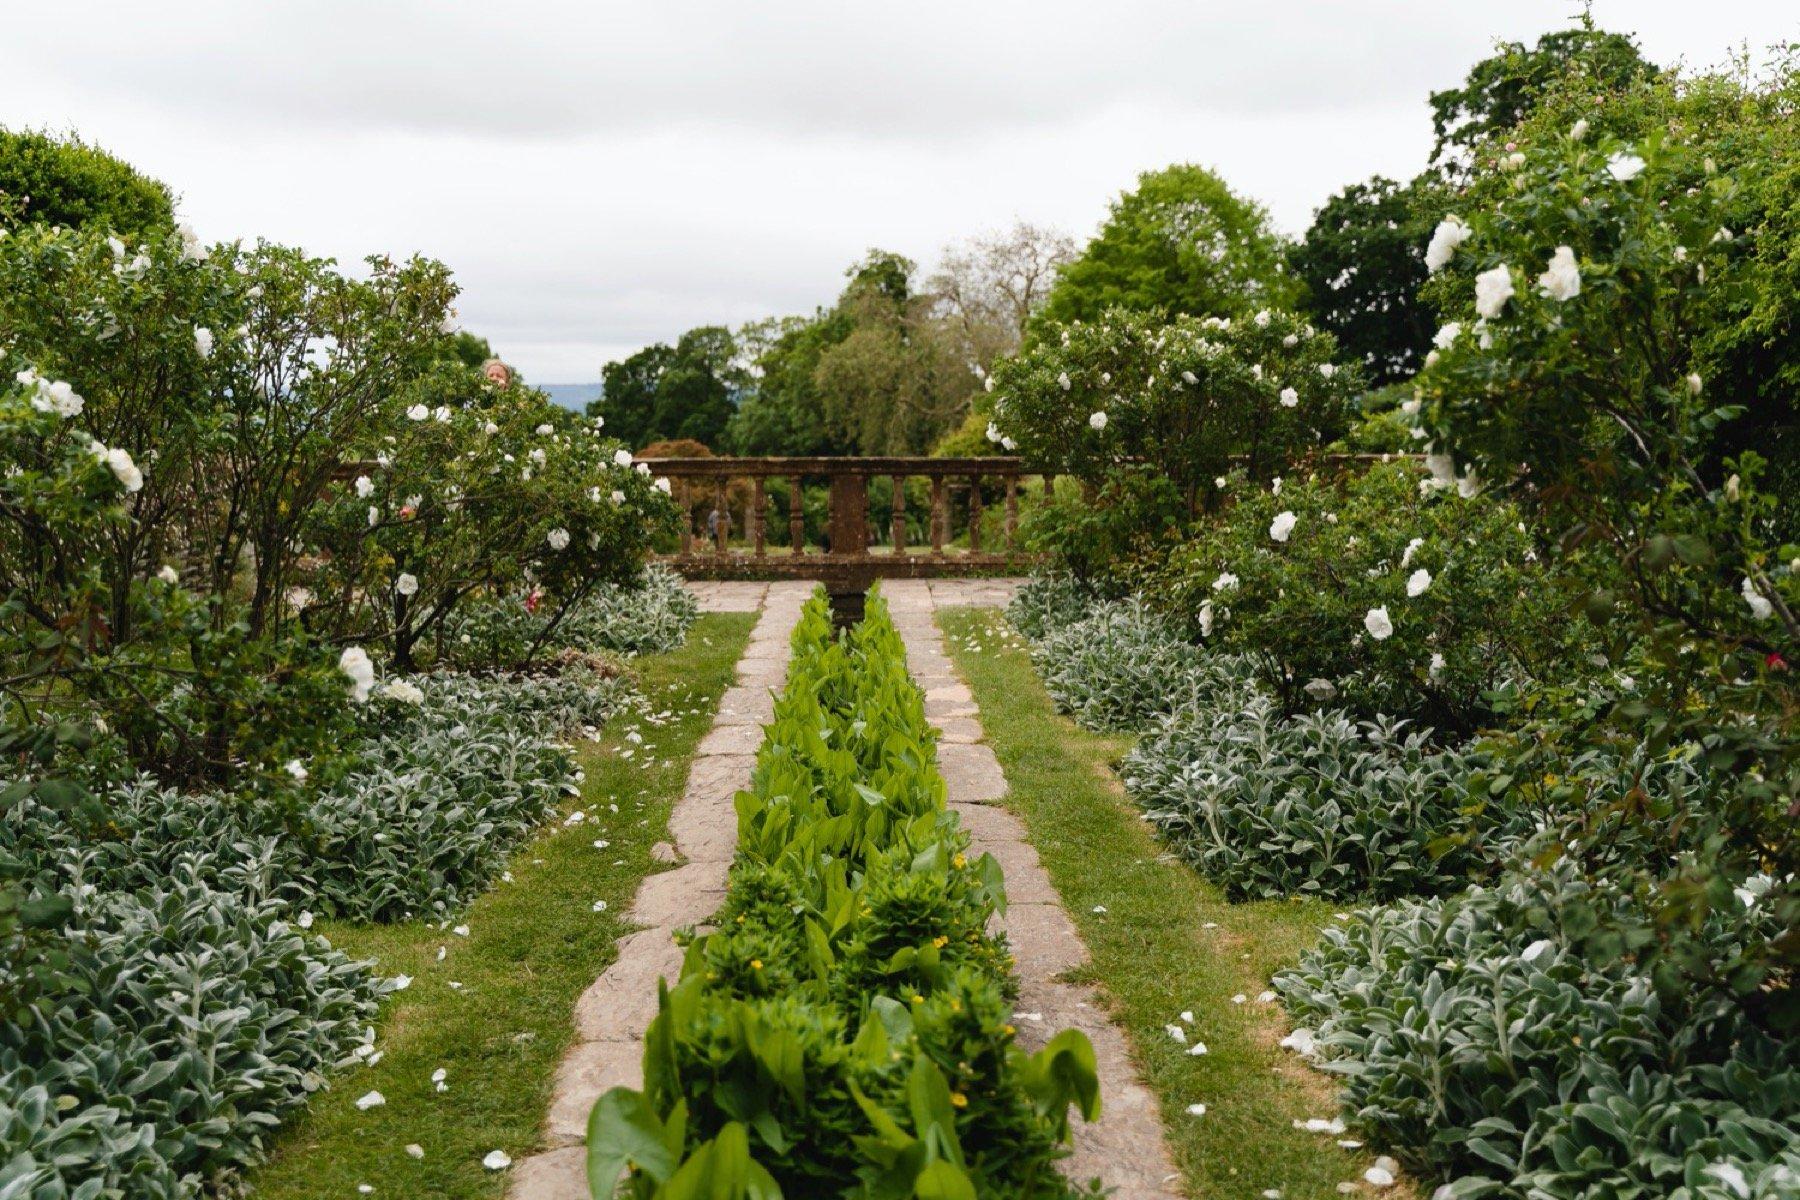 hestercombe gardens view